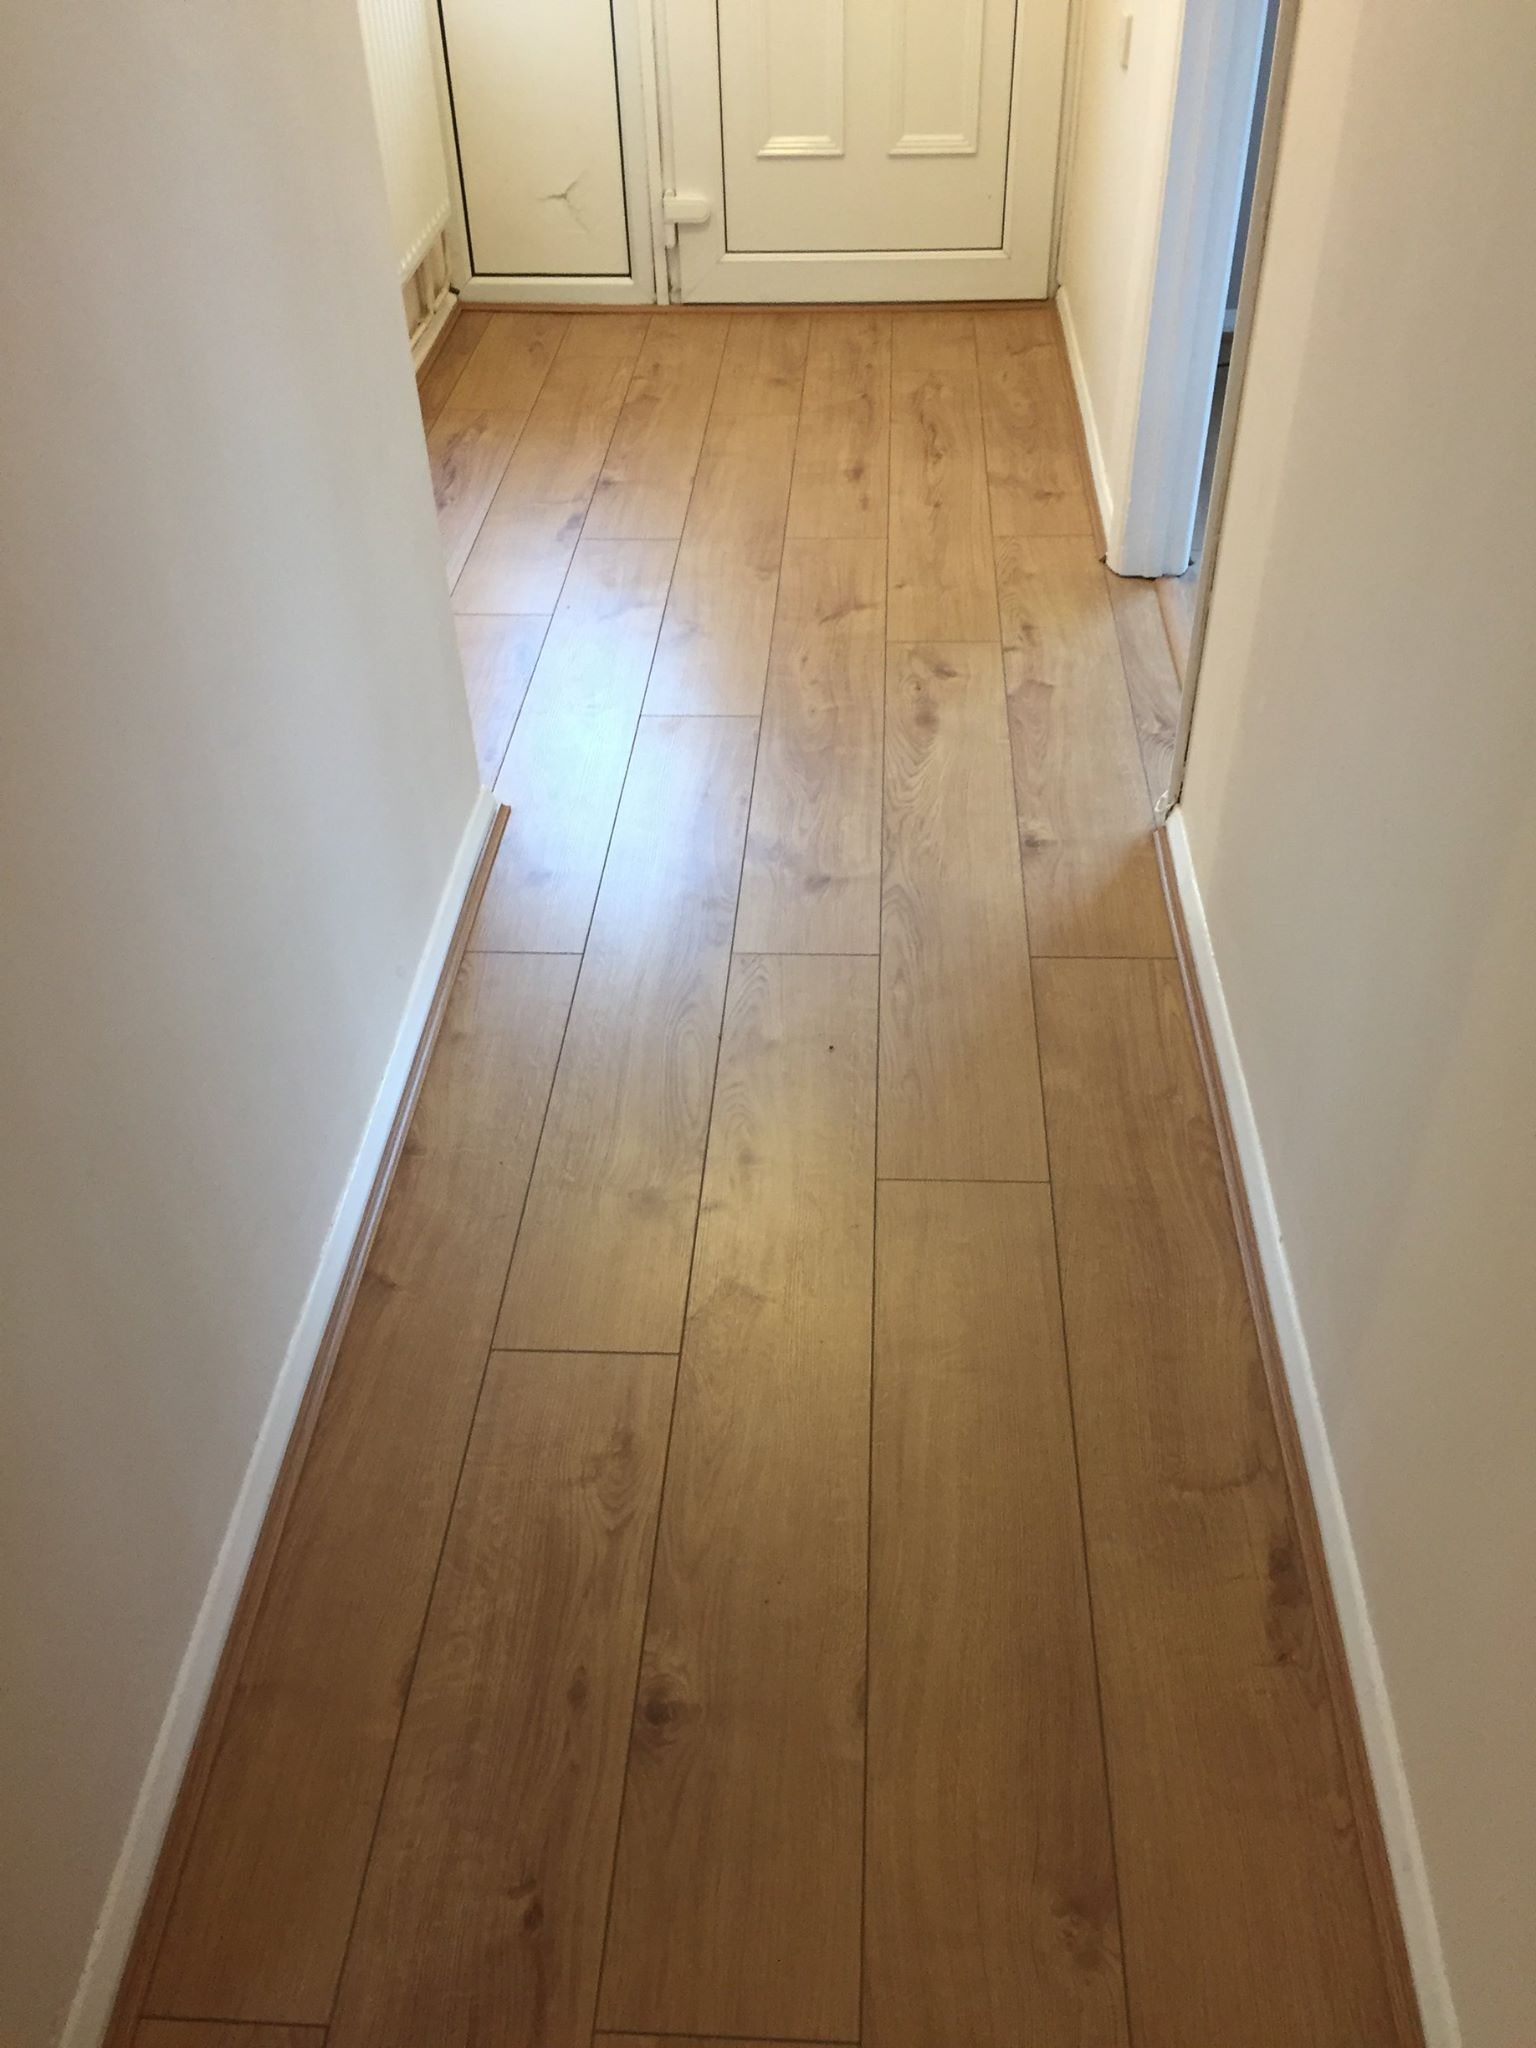 Laminate flooring bicester property interiors - How long does laminate flooring last ...